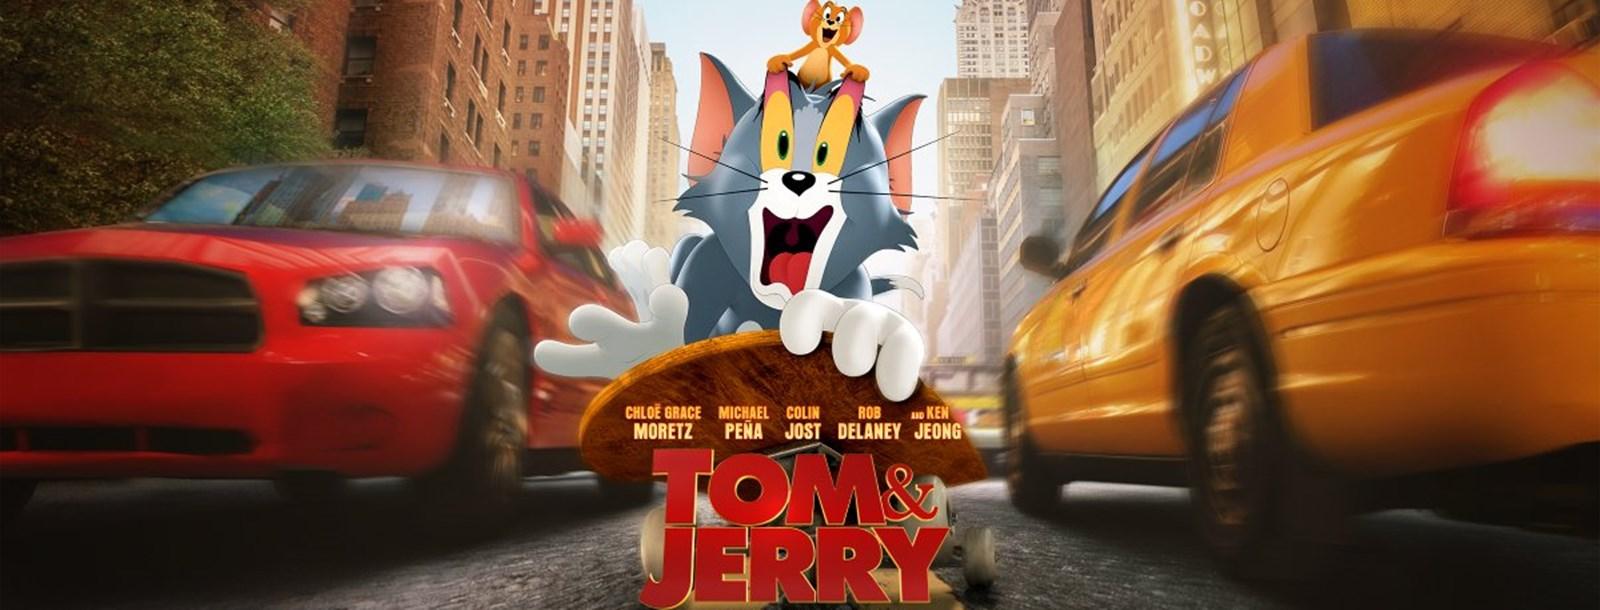 Tom and Jerry - Greota pritužbi